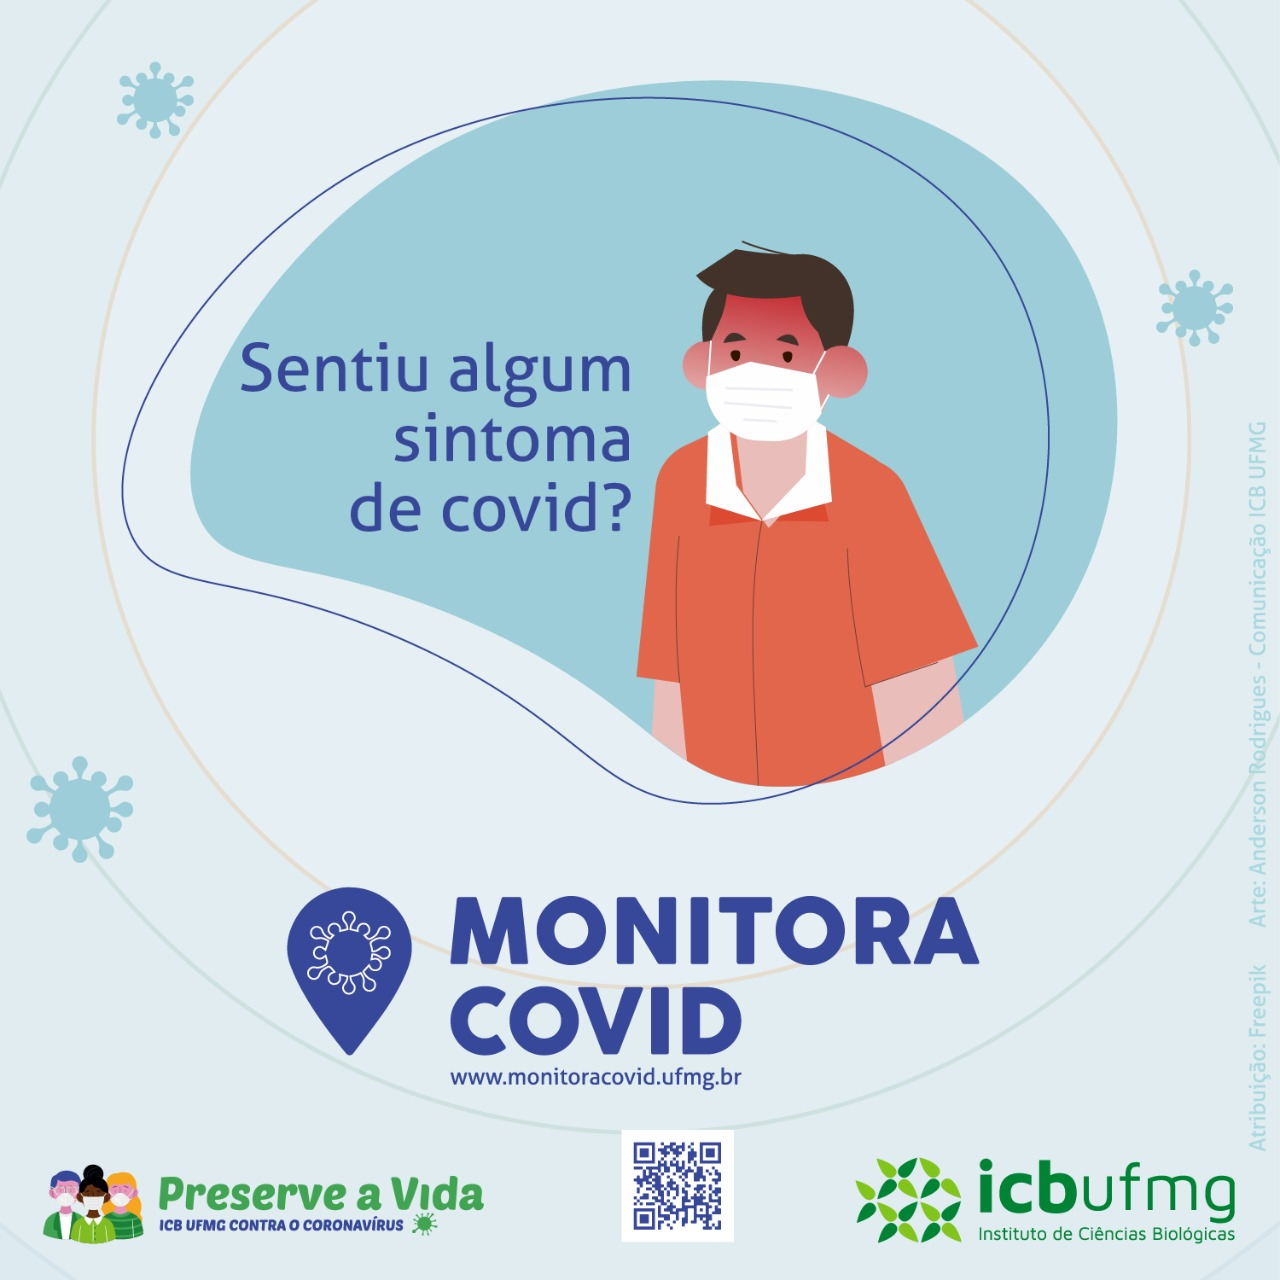 Monitora.covid Sintomas